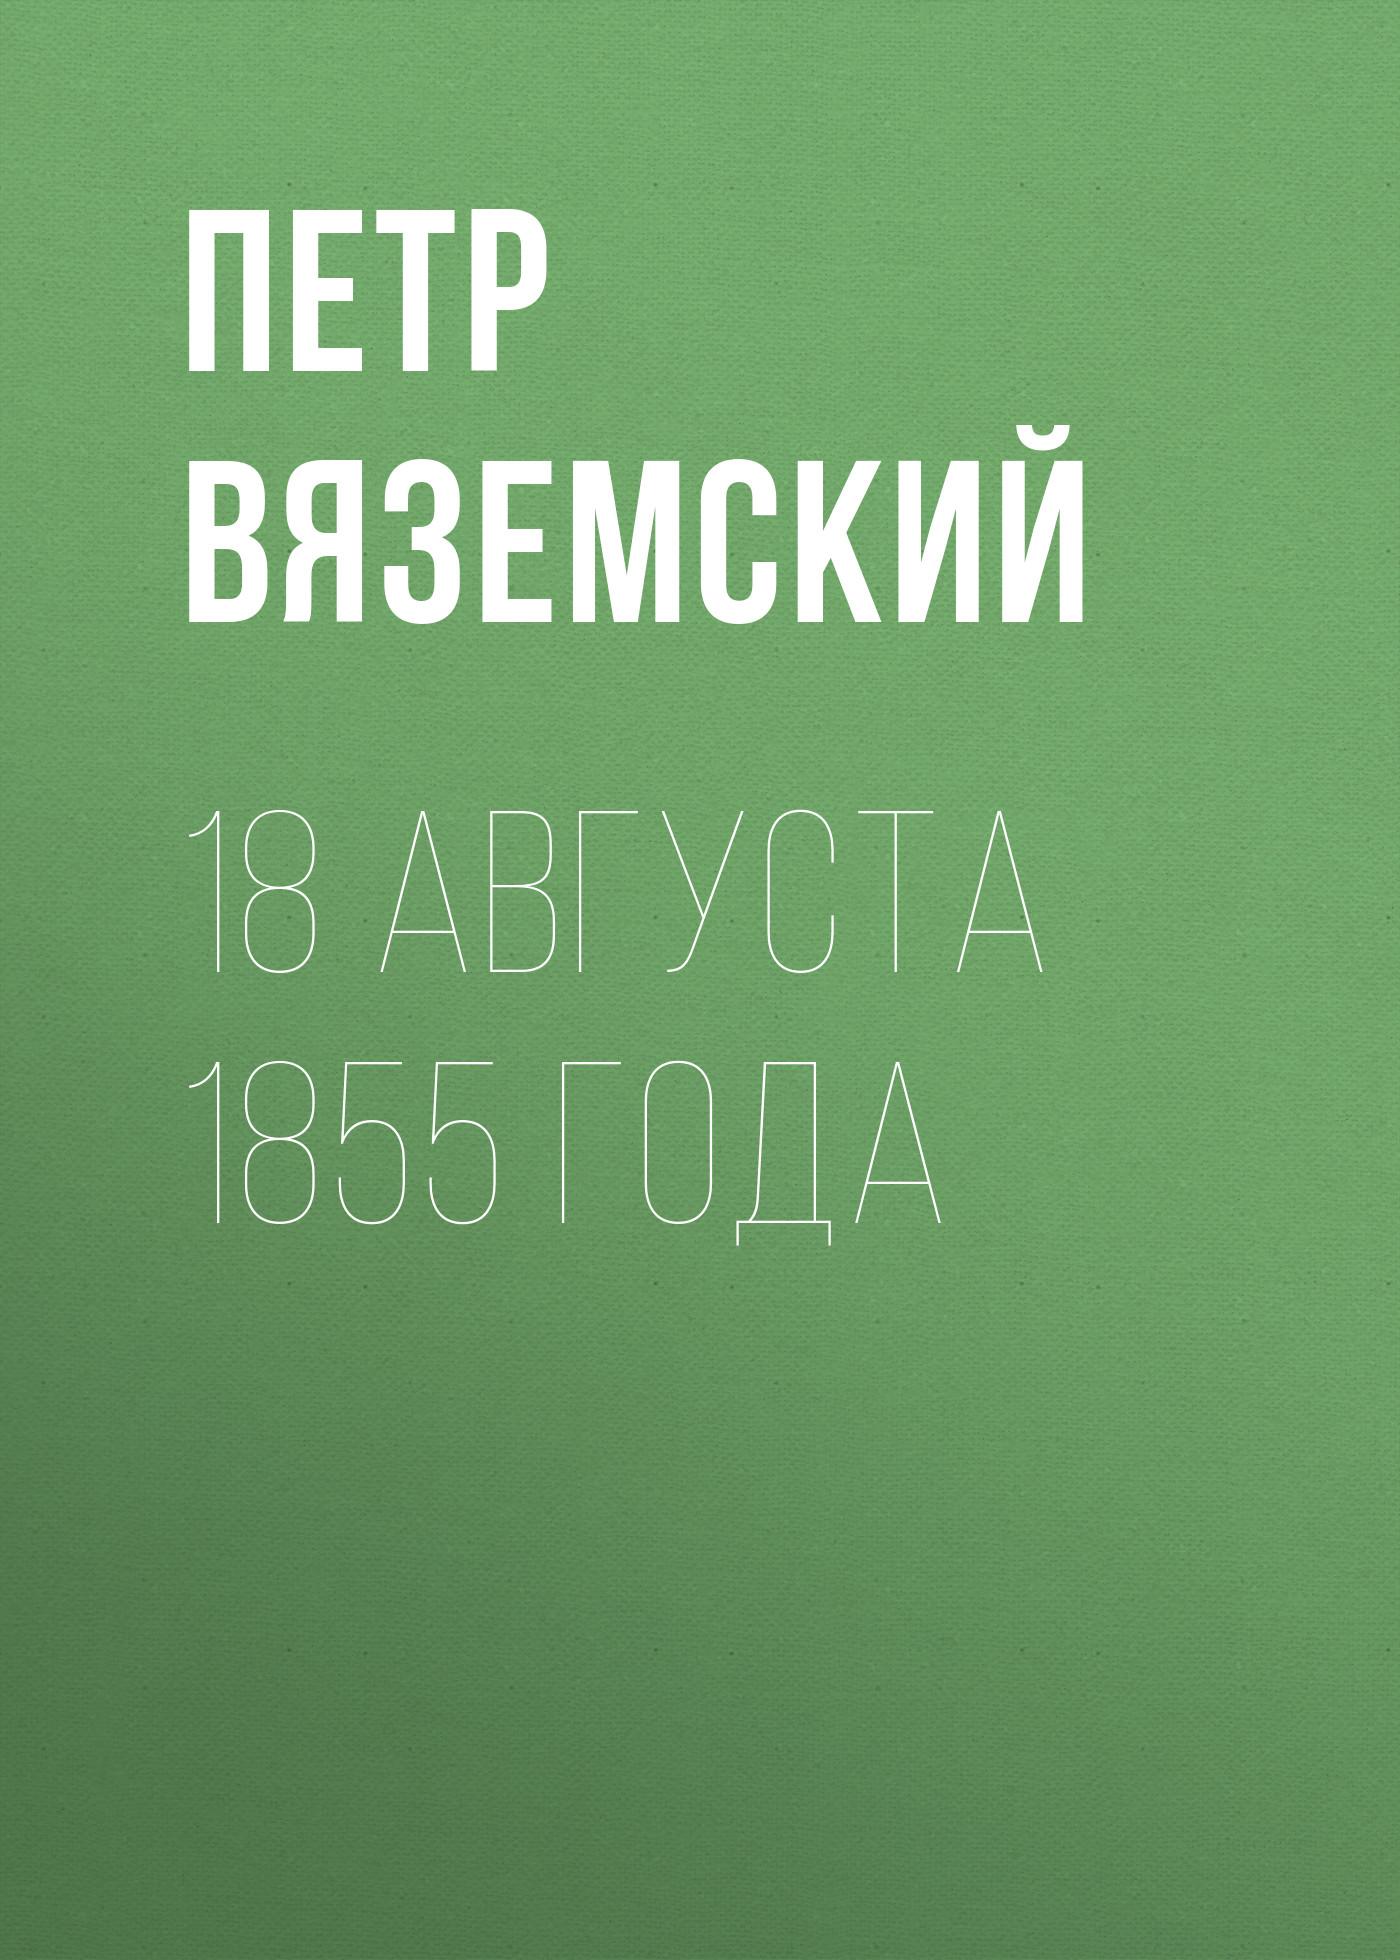 Петр Вяземский 18 августа 1855 года петр вяземский за границею корректурные листы